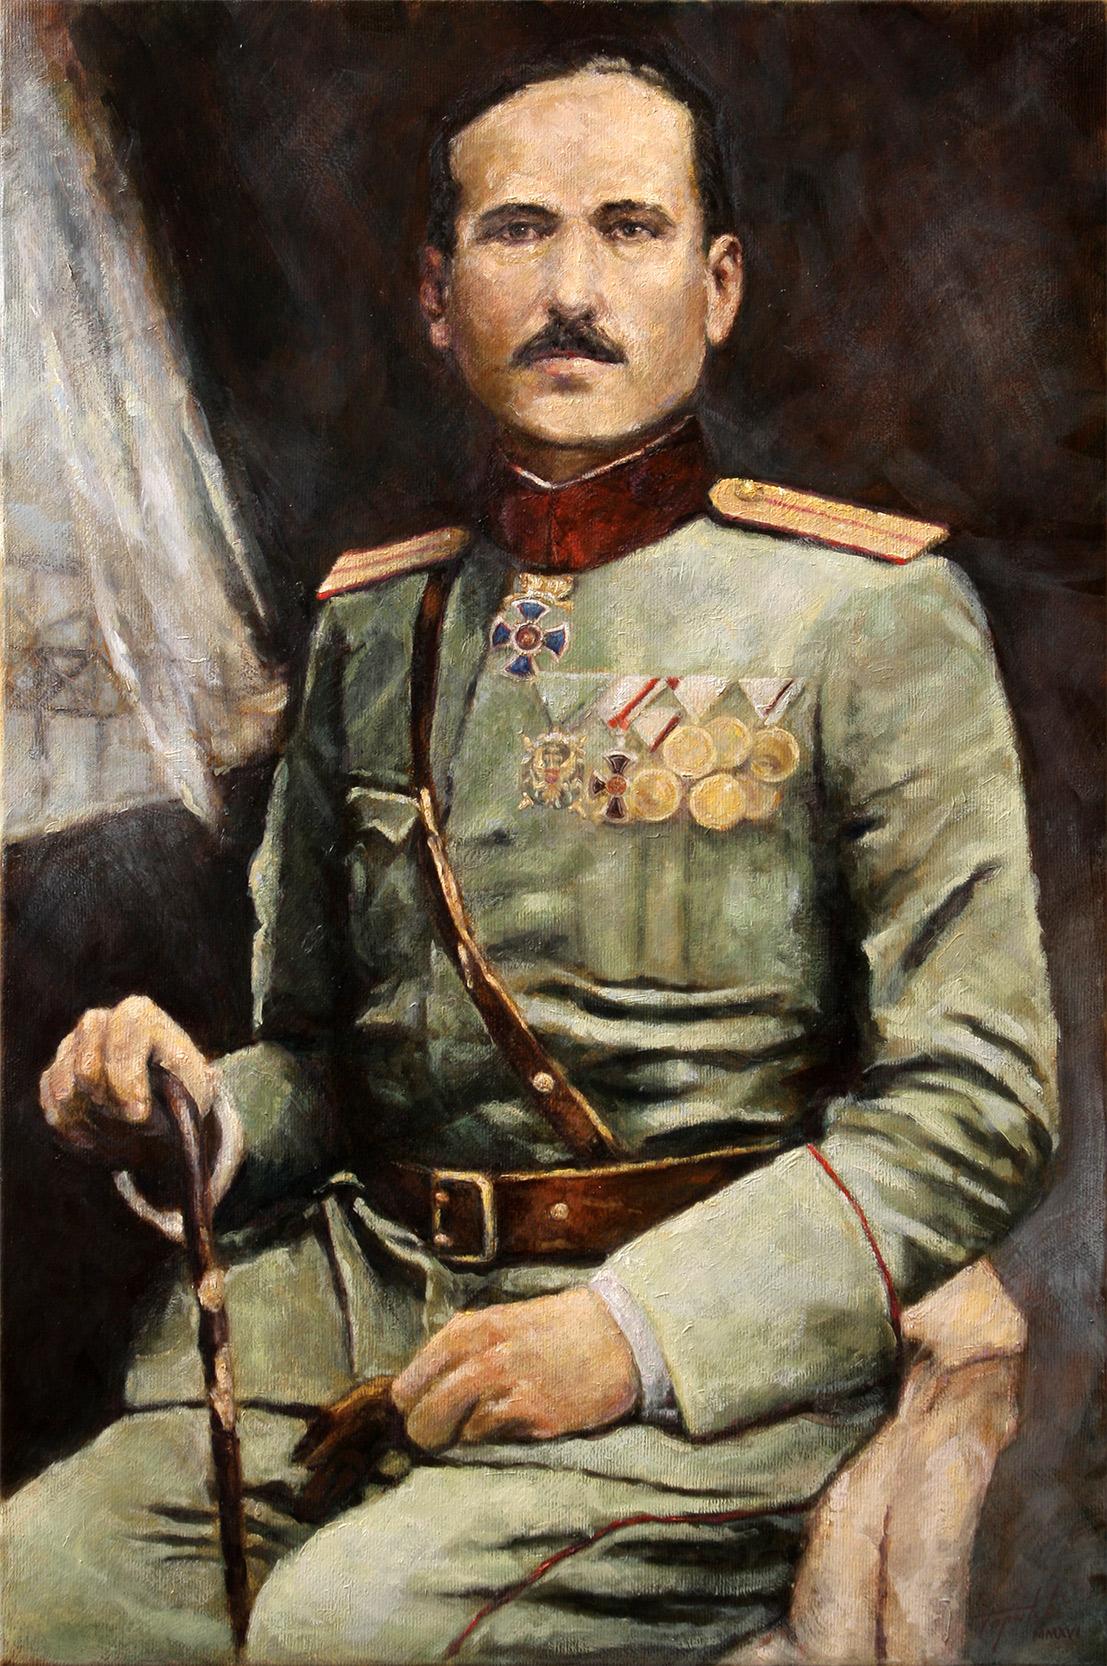 Fine Art -Krsto Zrnov Popovic - Original Portrait Oil Painting on Canvas by artist Darko Topalski